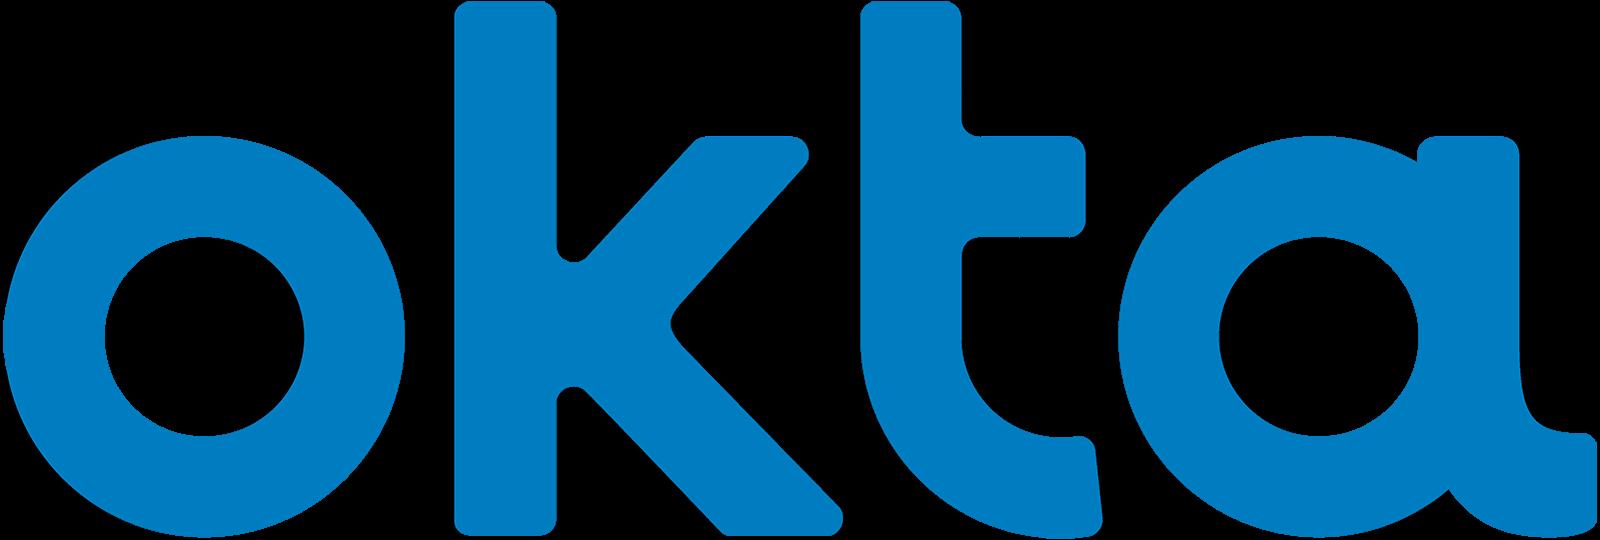 Okta AU logo